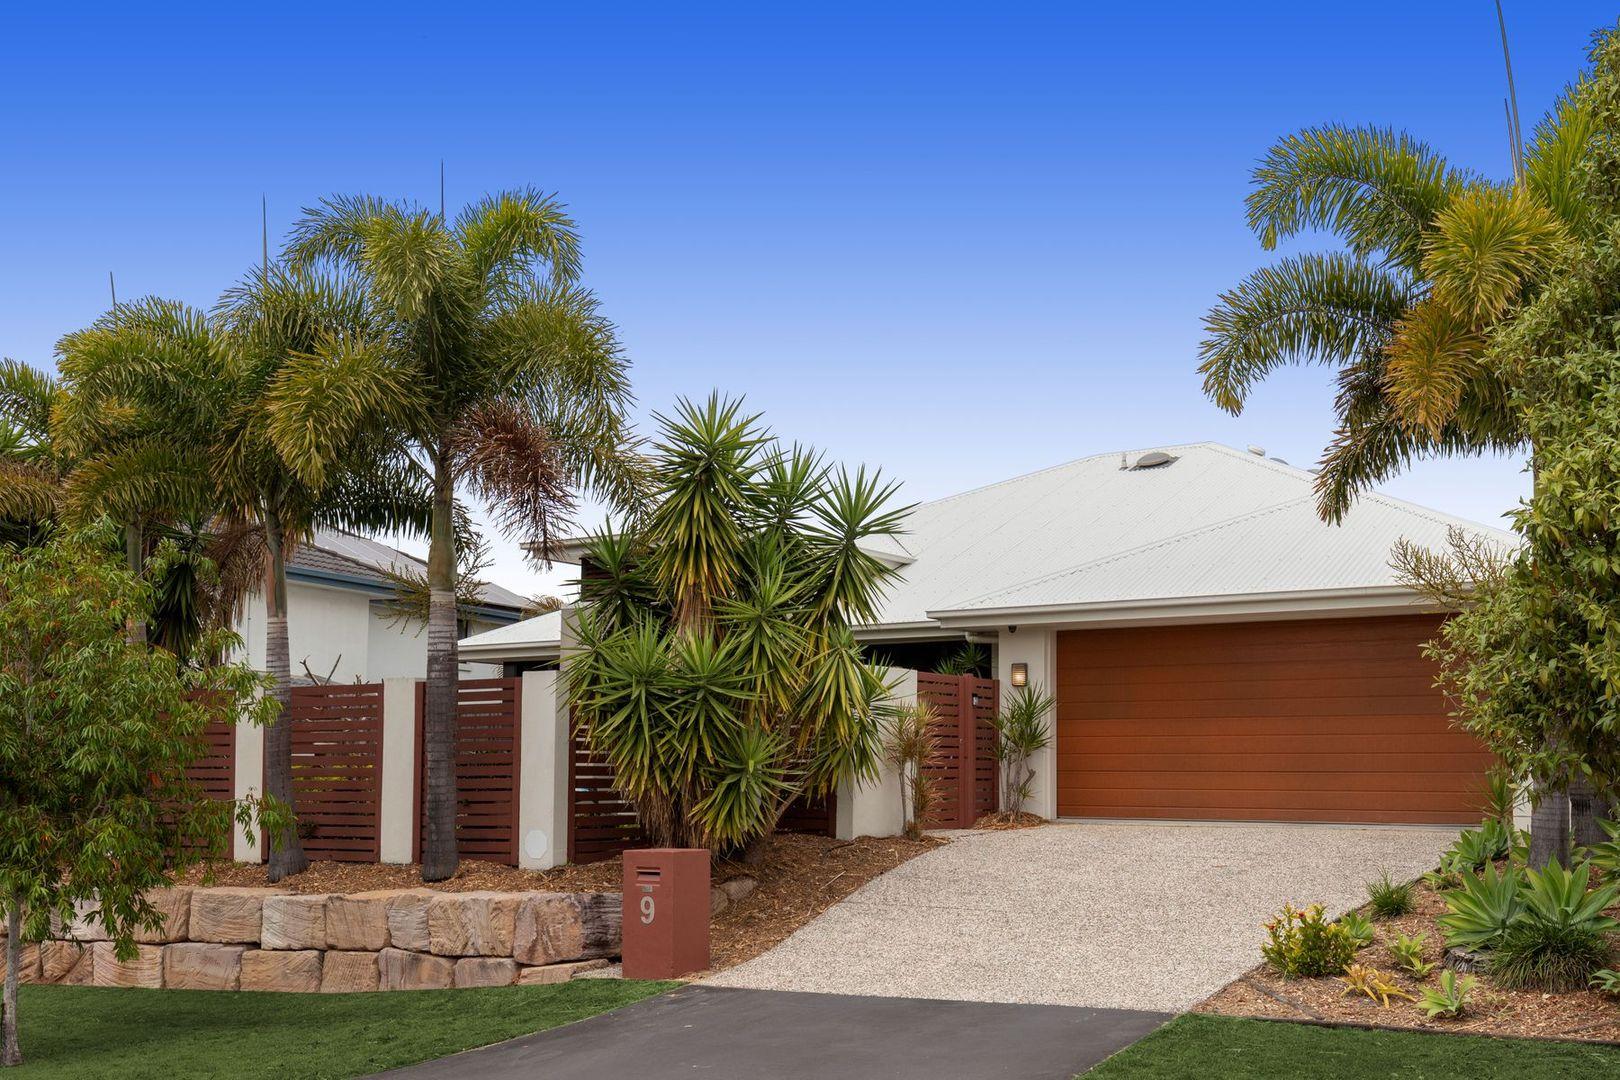 9 Backhousia Crescent, Sinnamon Park QLD 4073, Image 0